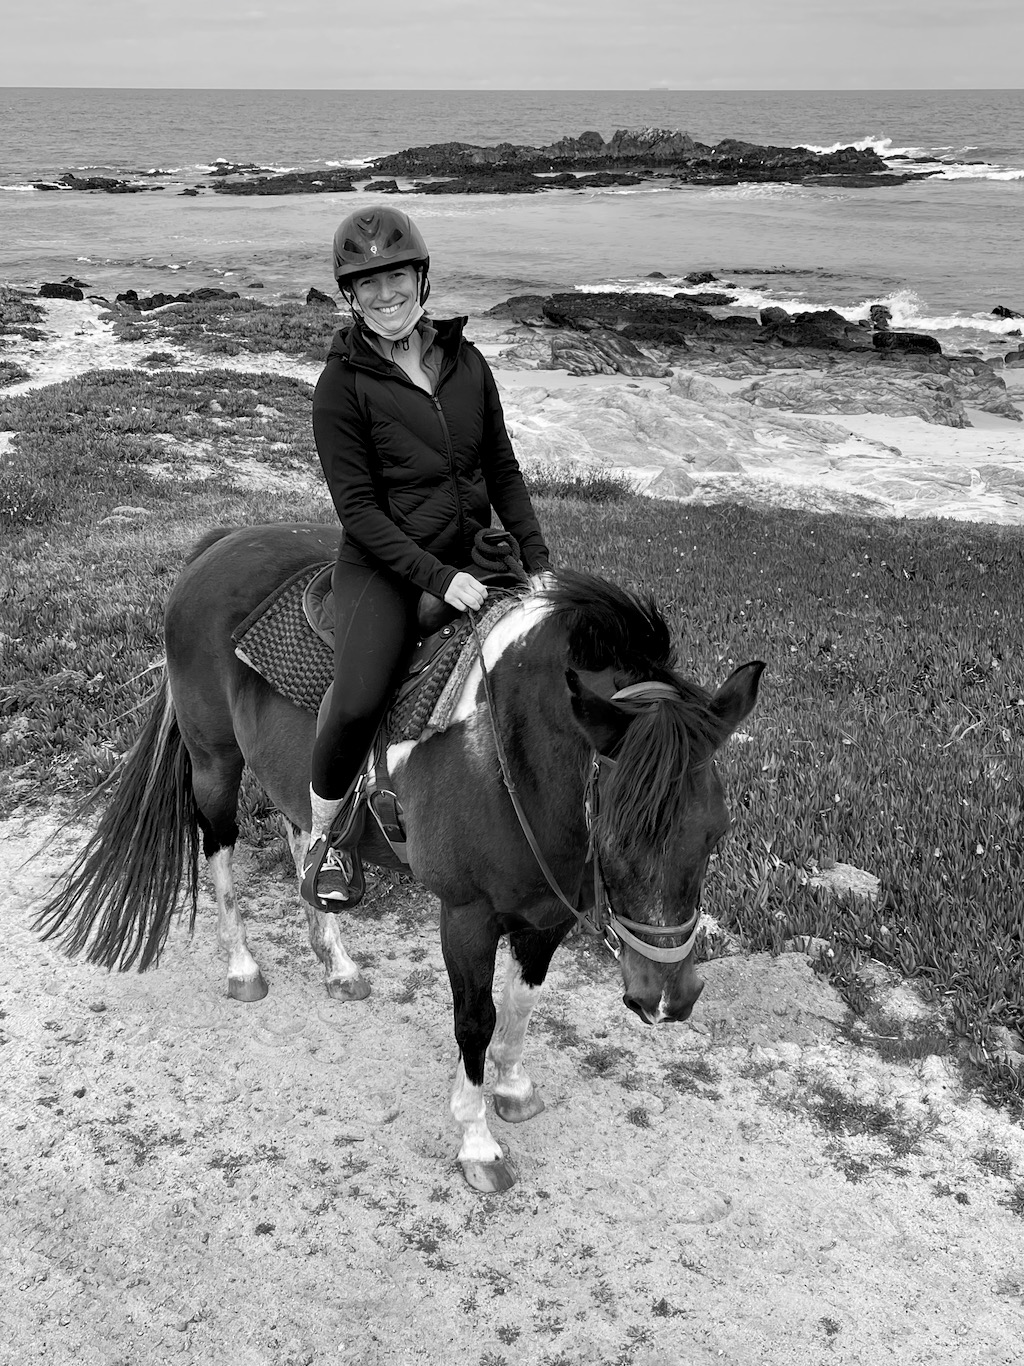 Shelby horseback riding.